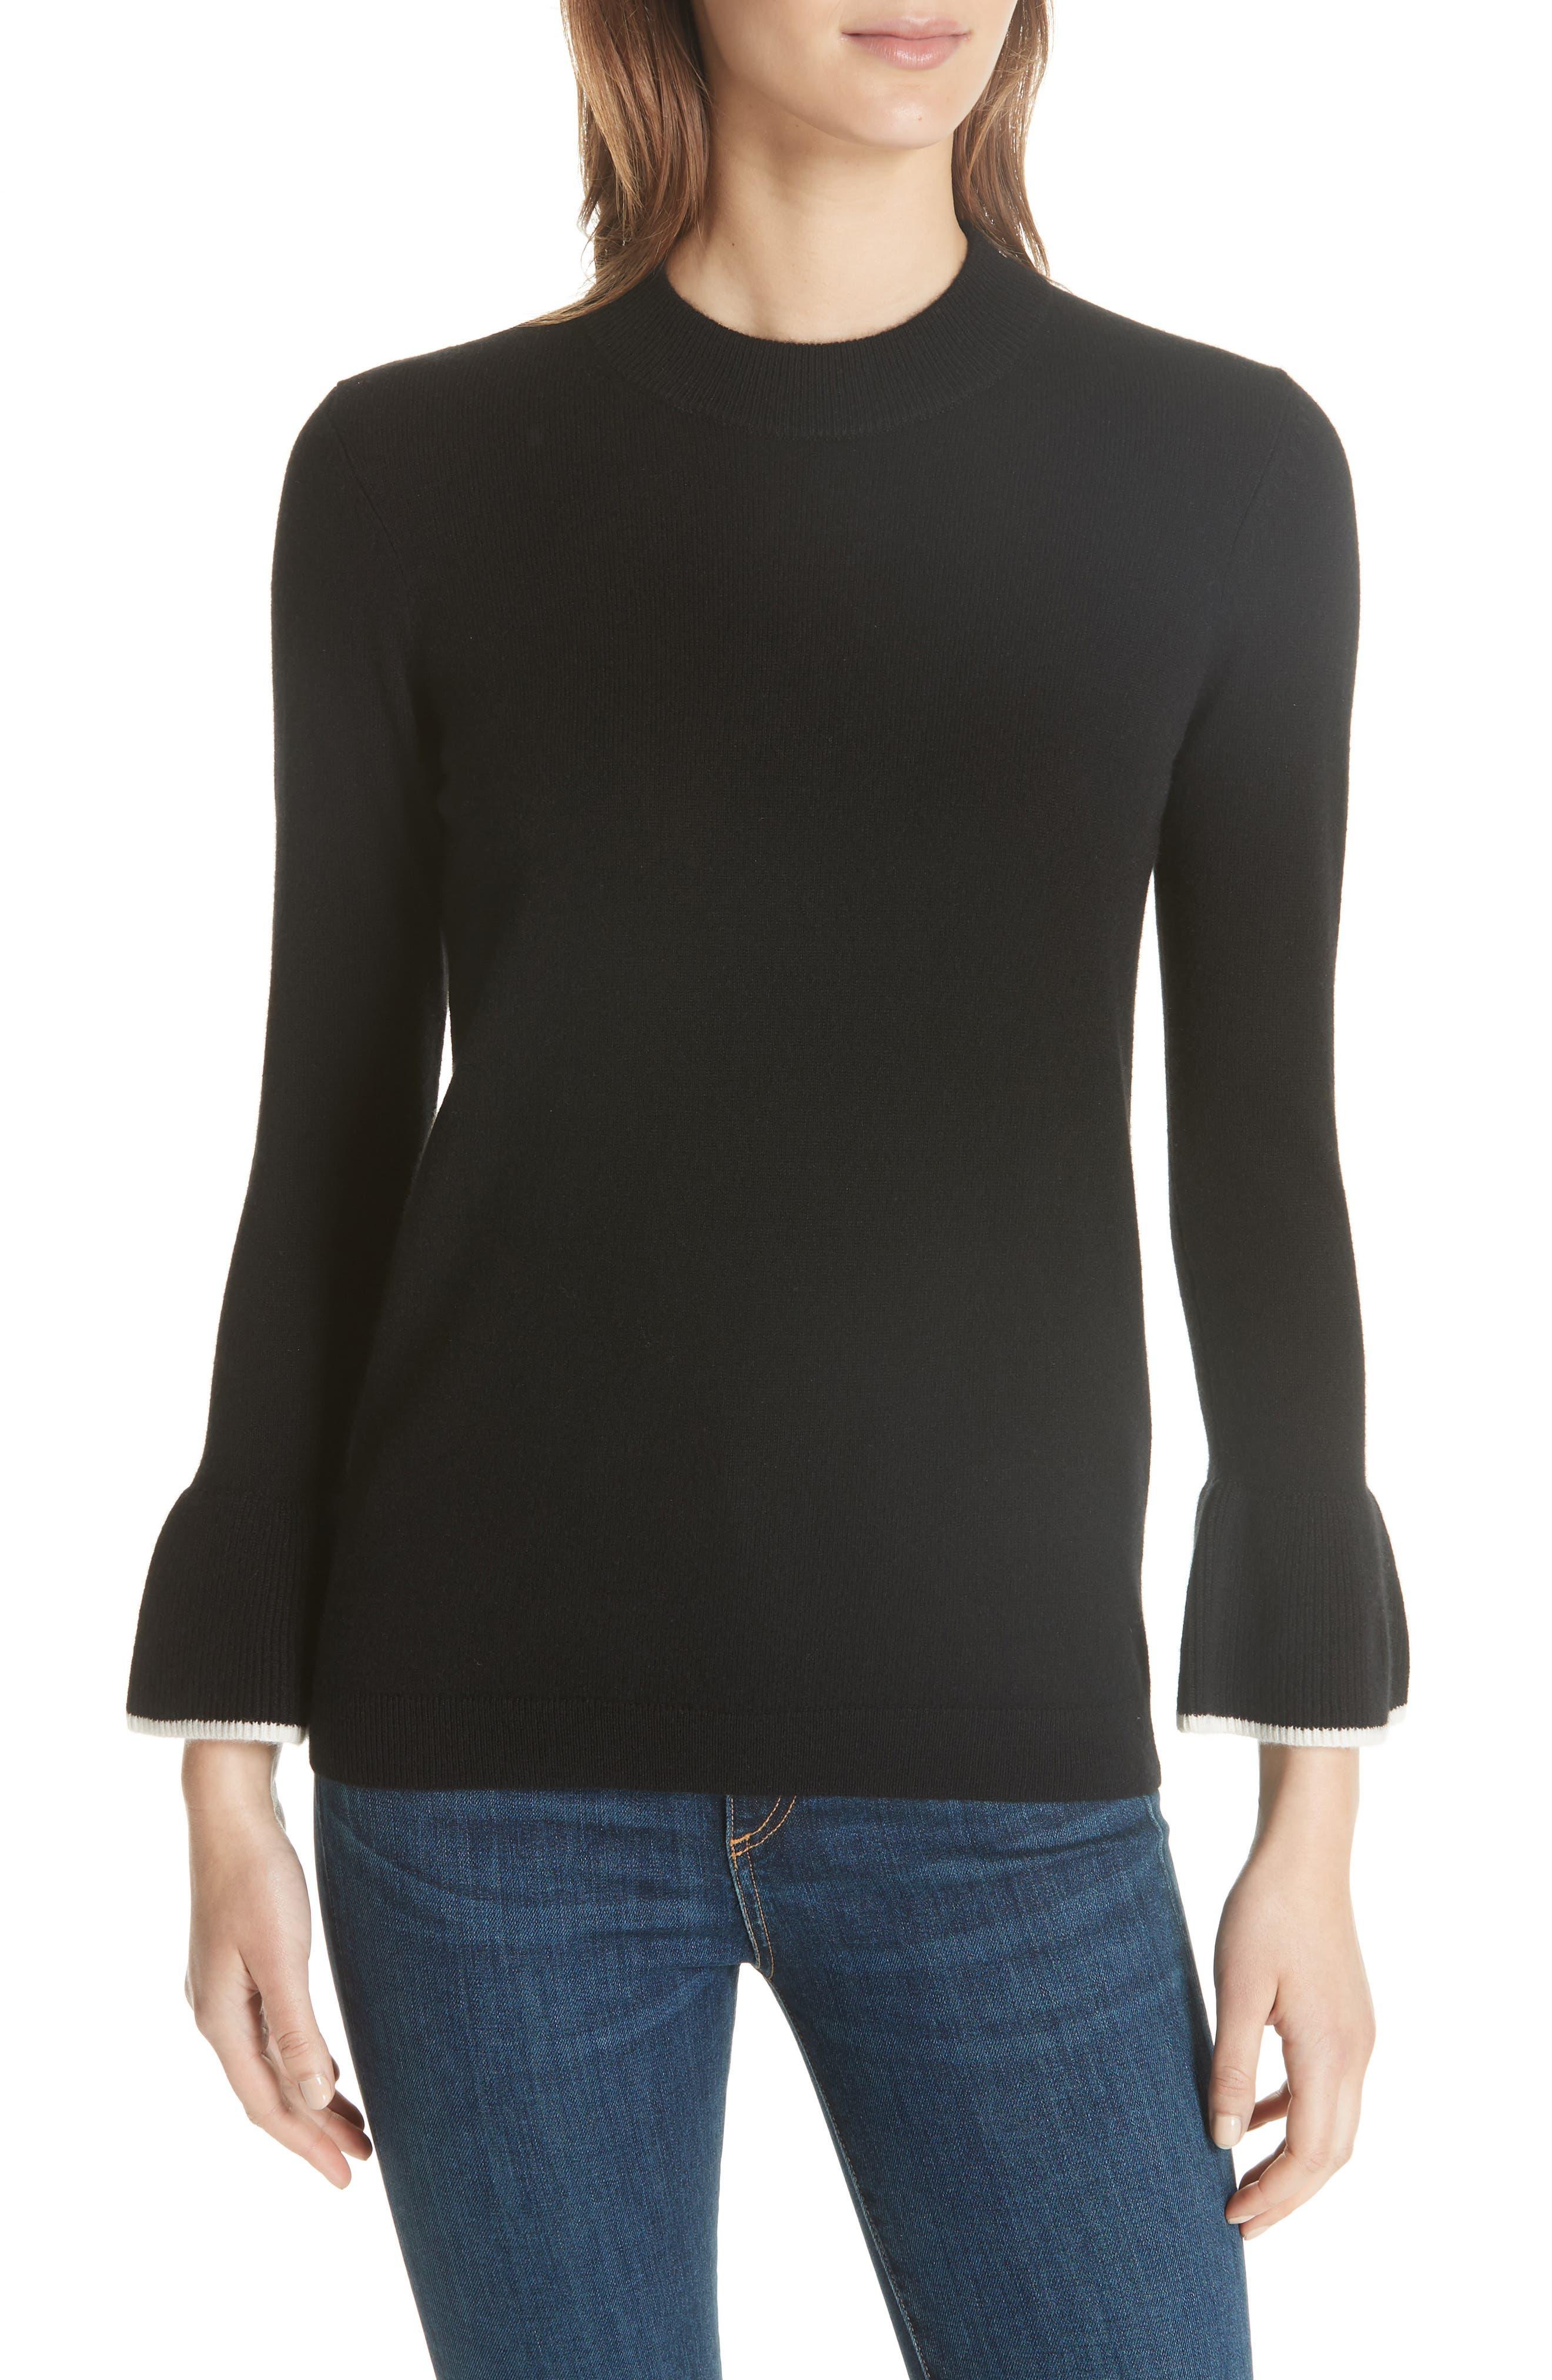 Main Image - Veronica Beard Mar Cashmere Sweater